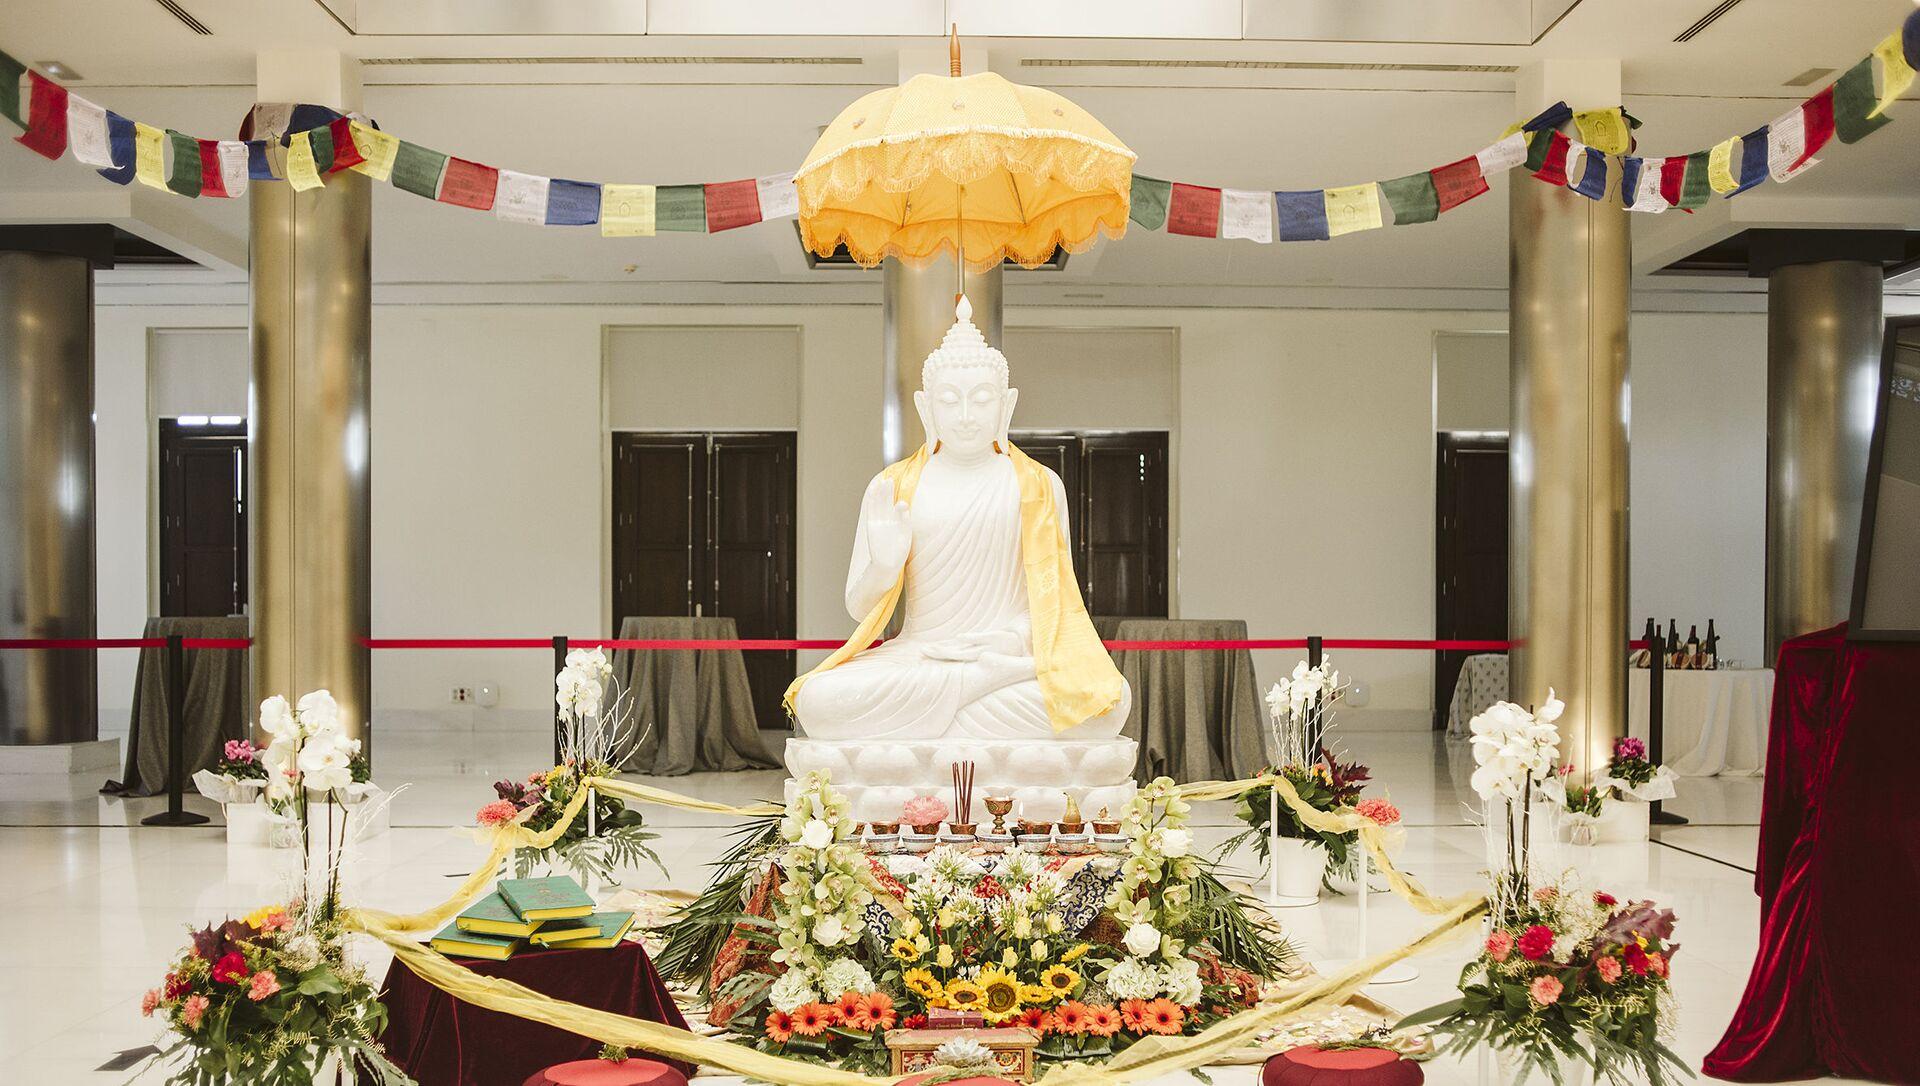 Estatua de Mahar Karuna Buddha en Valencia - Sputnik Mundo, 1920, 22.03.2021